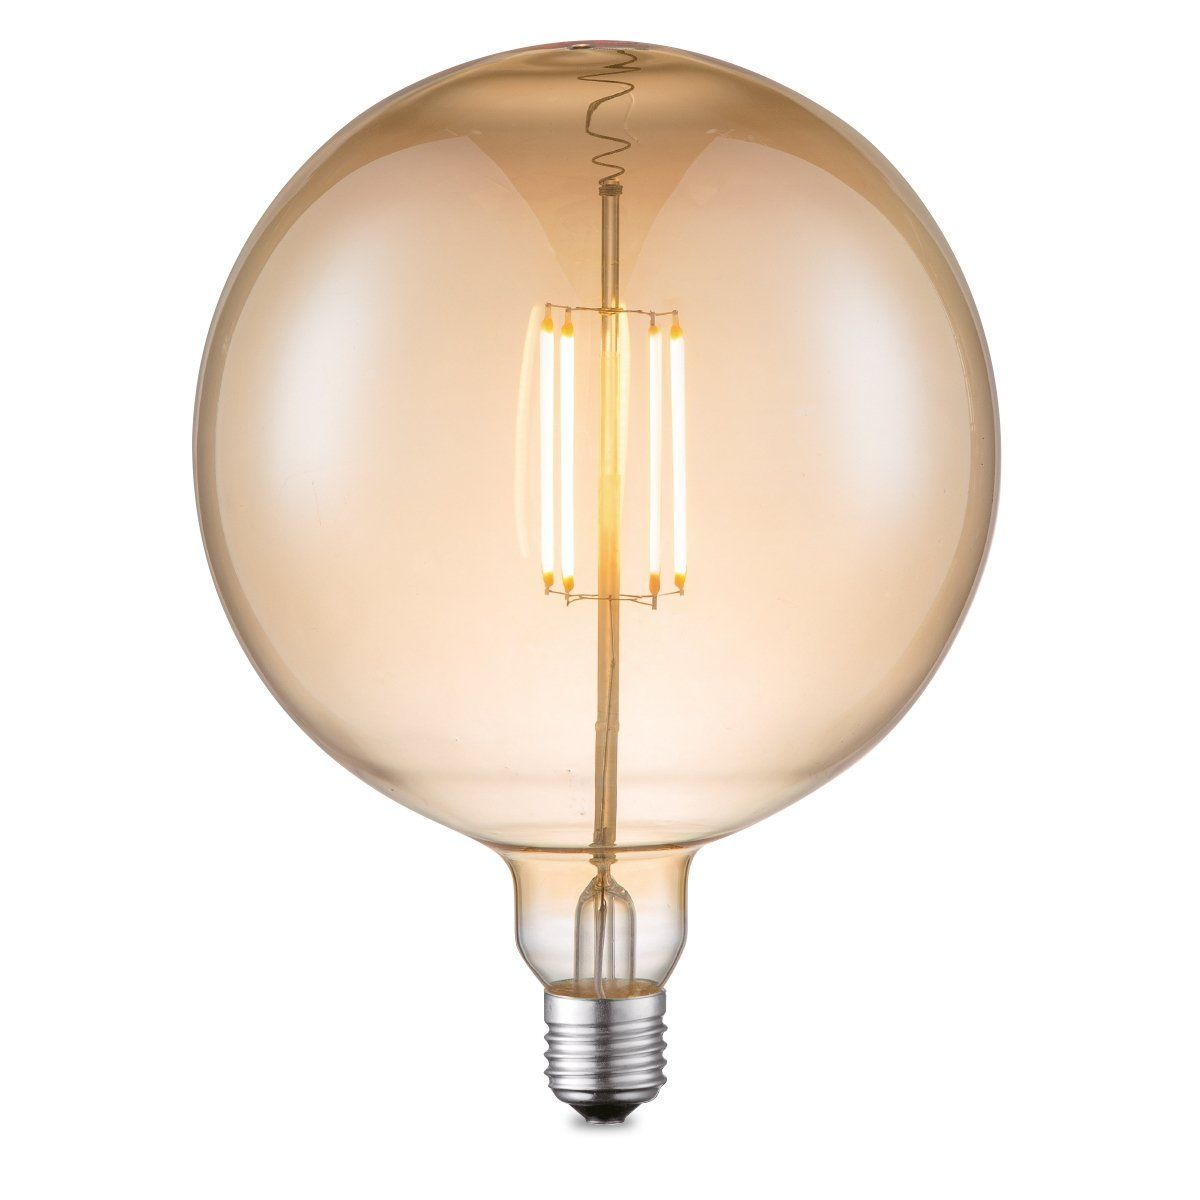 Home sweet home LED lamp Globe G180 E27 4W dimbaar - amber